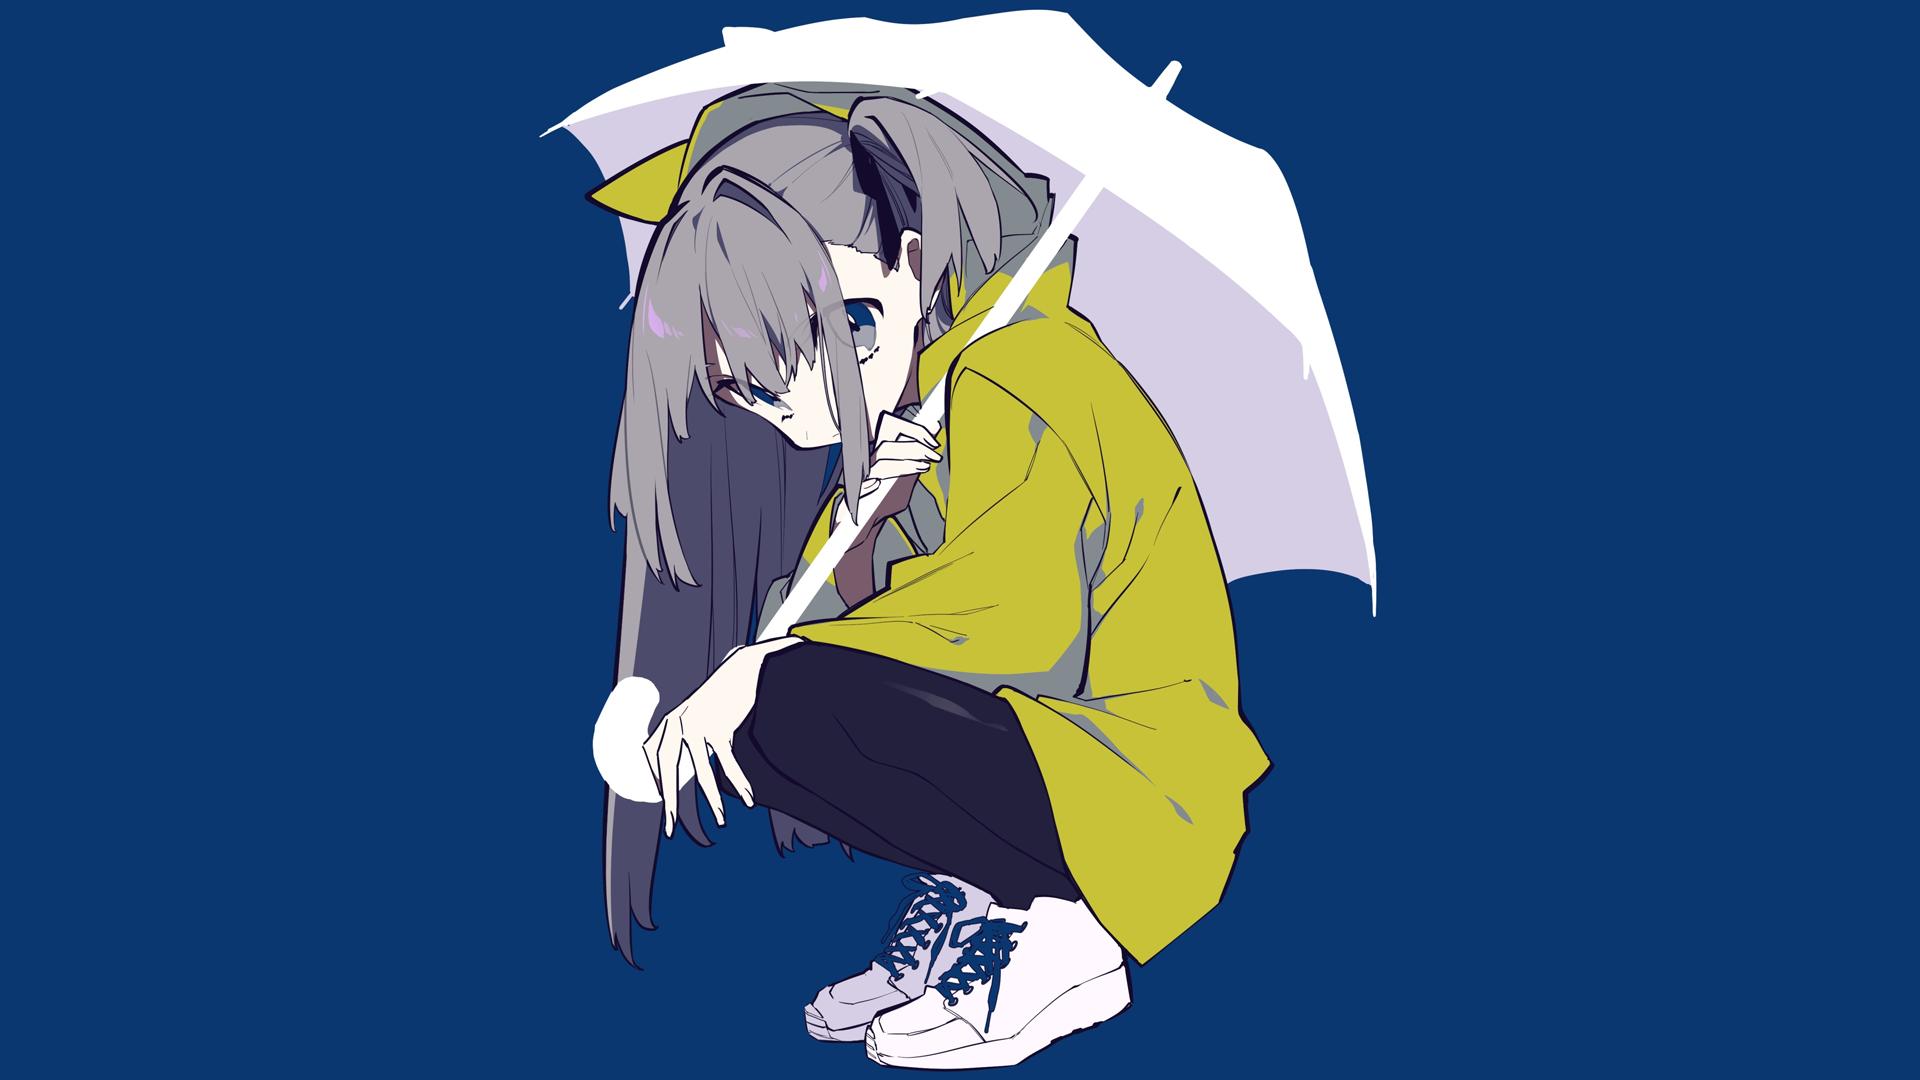 Anime Manga Girls Simple Background Blue Umbrella Grey Hair